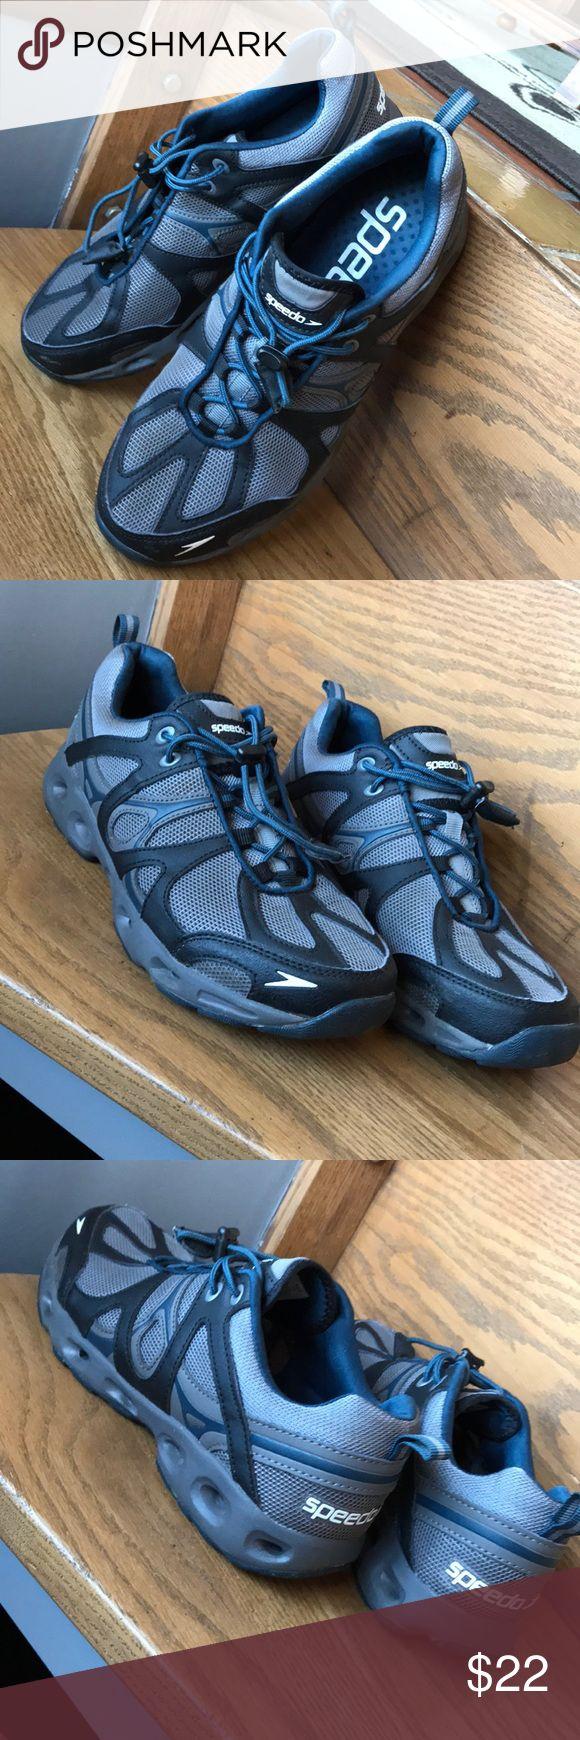 Speedo Size 8 Speedo Water/Hiking shoes Unisex Size 8 ... New Shoes Athletic Shoes